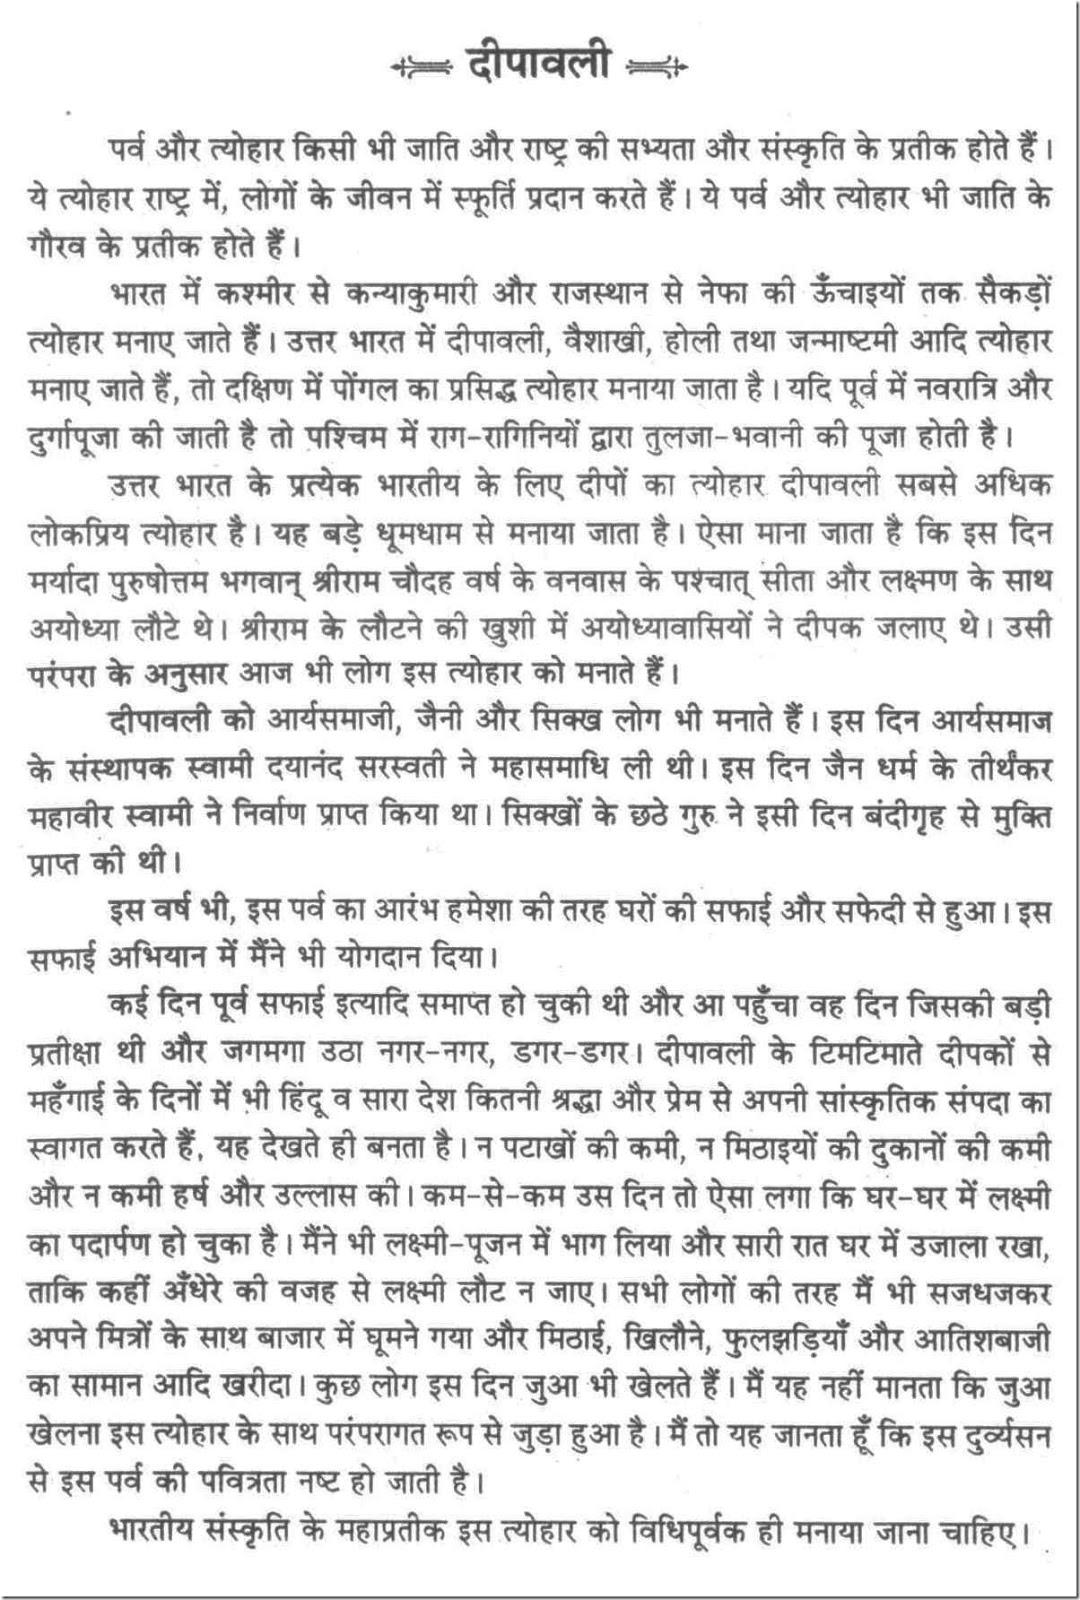 diwali dissertation with marathi font